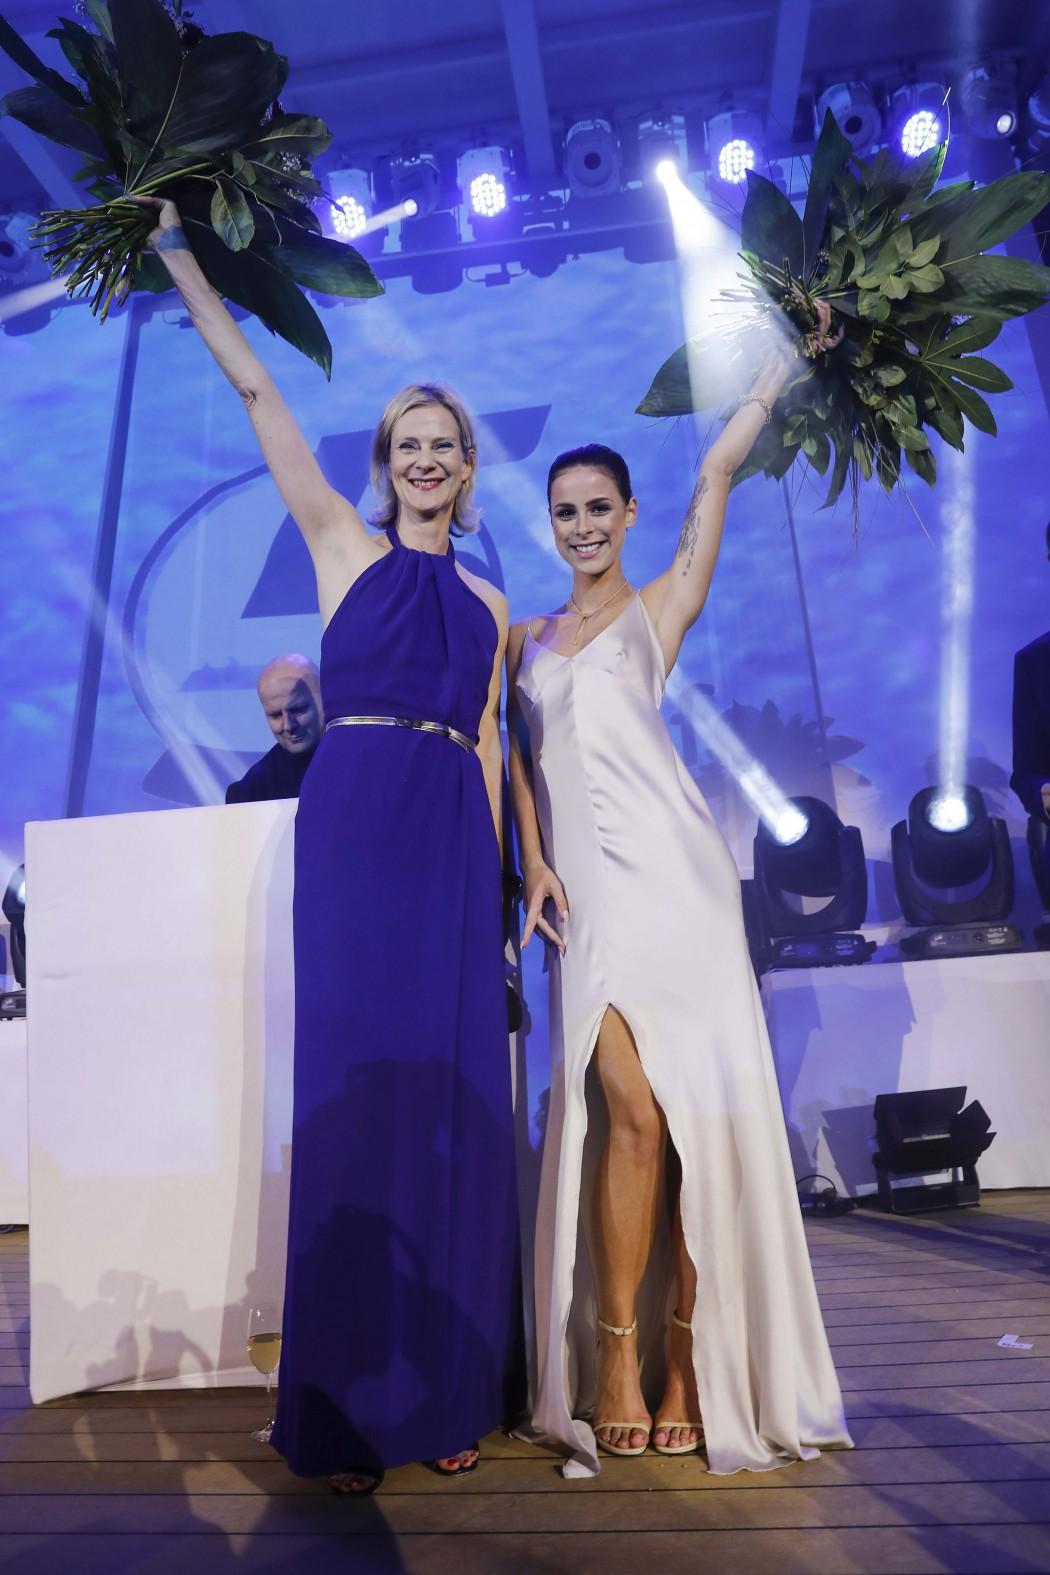 Es ist vollbracht: Mei Schiff 5 Taufpatin Lena Meyer-Landrut feiert mit TUI Cruises Chefin Wybcke Meier (Photo by Franziska Krug/Getty Images for TUI Cruises)